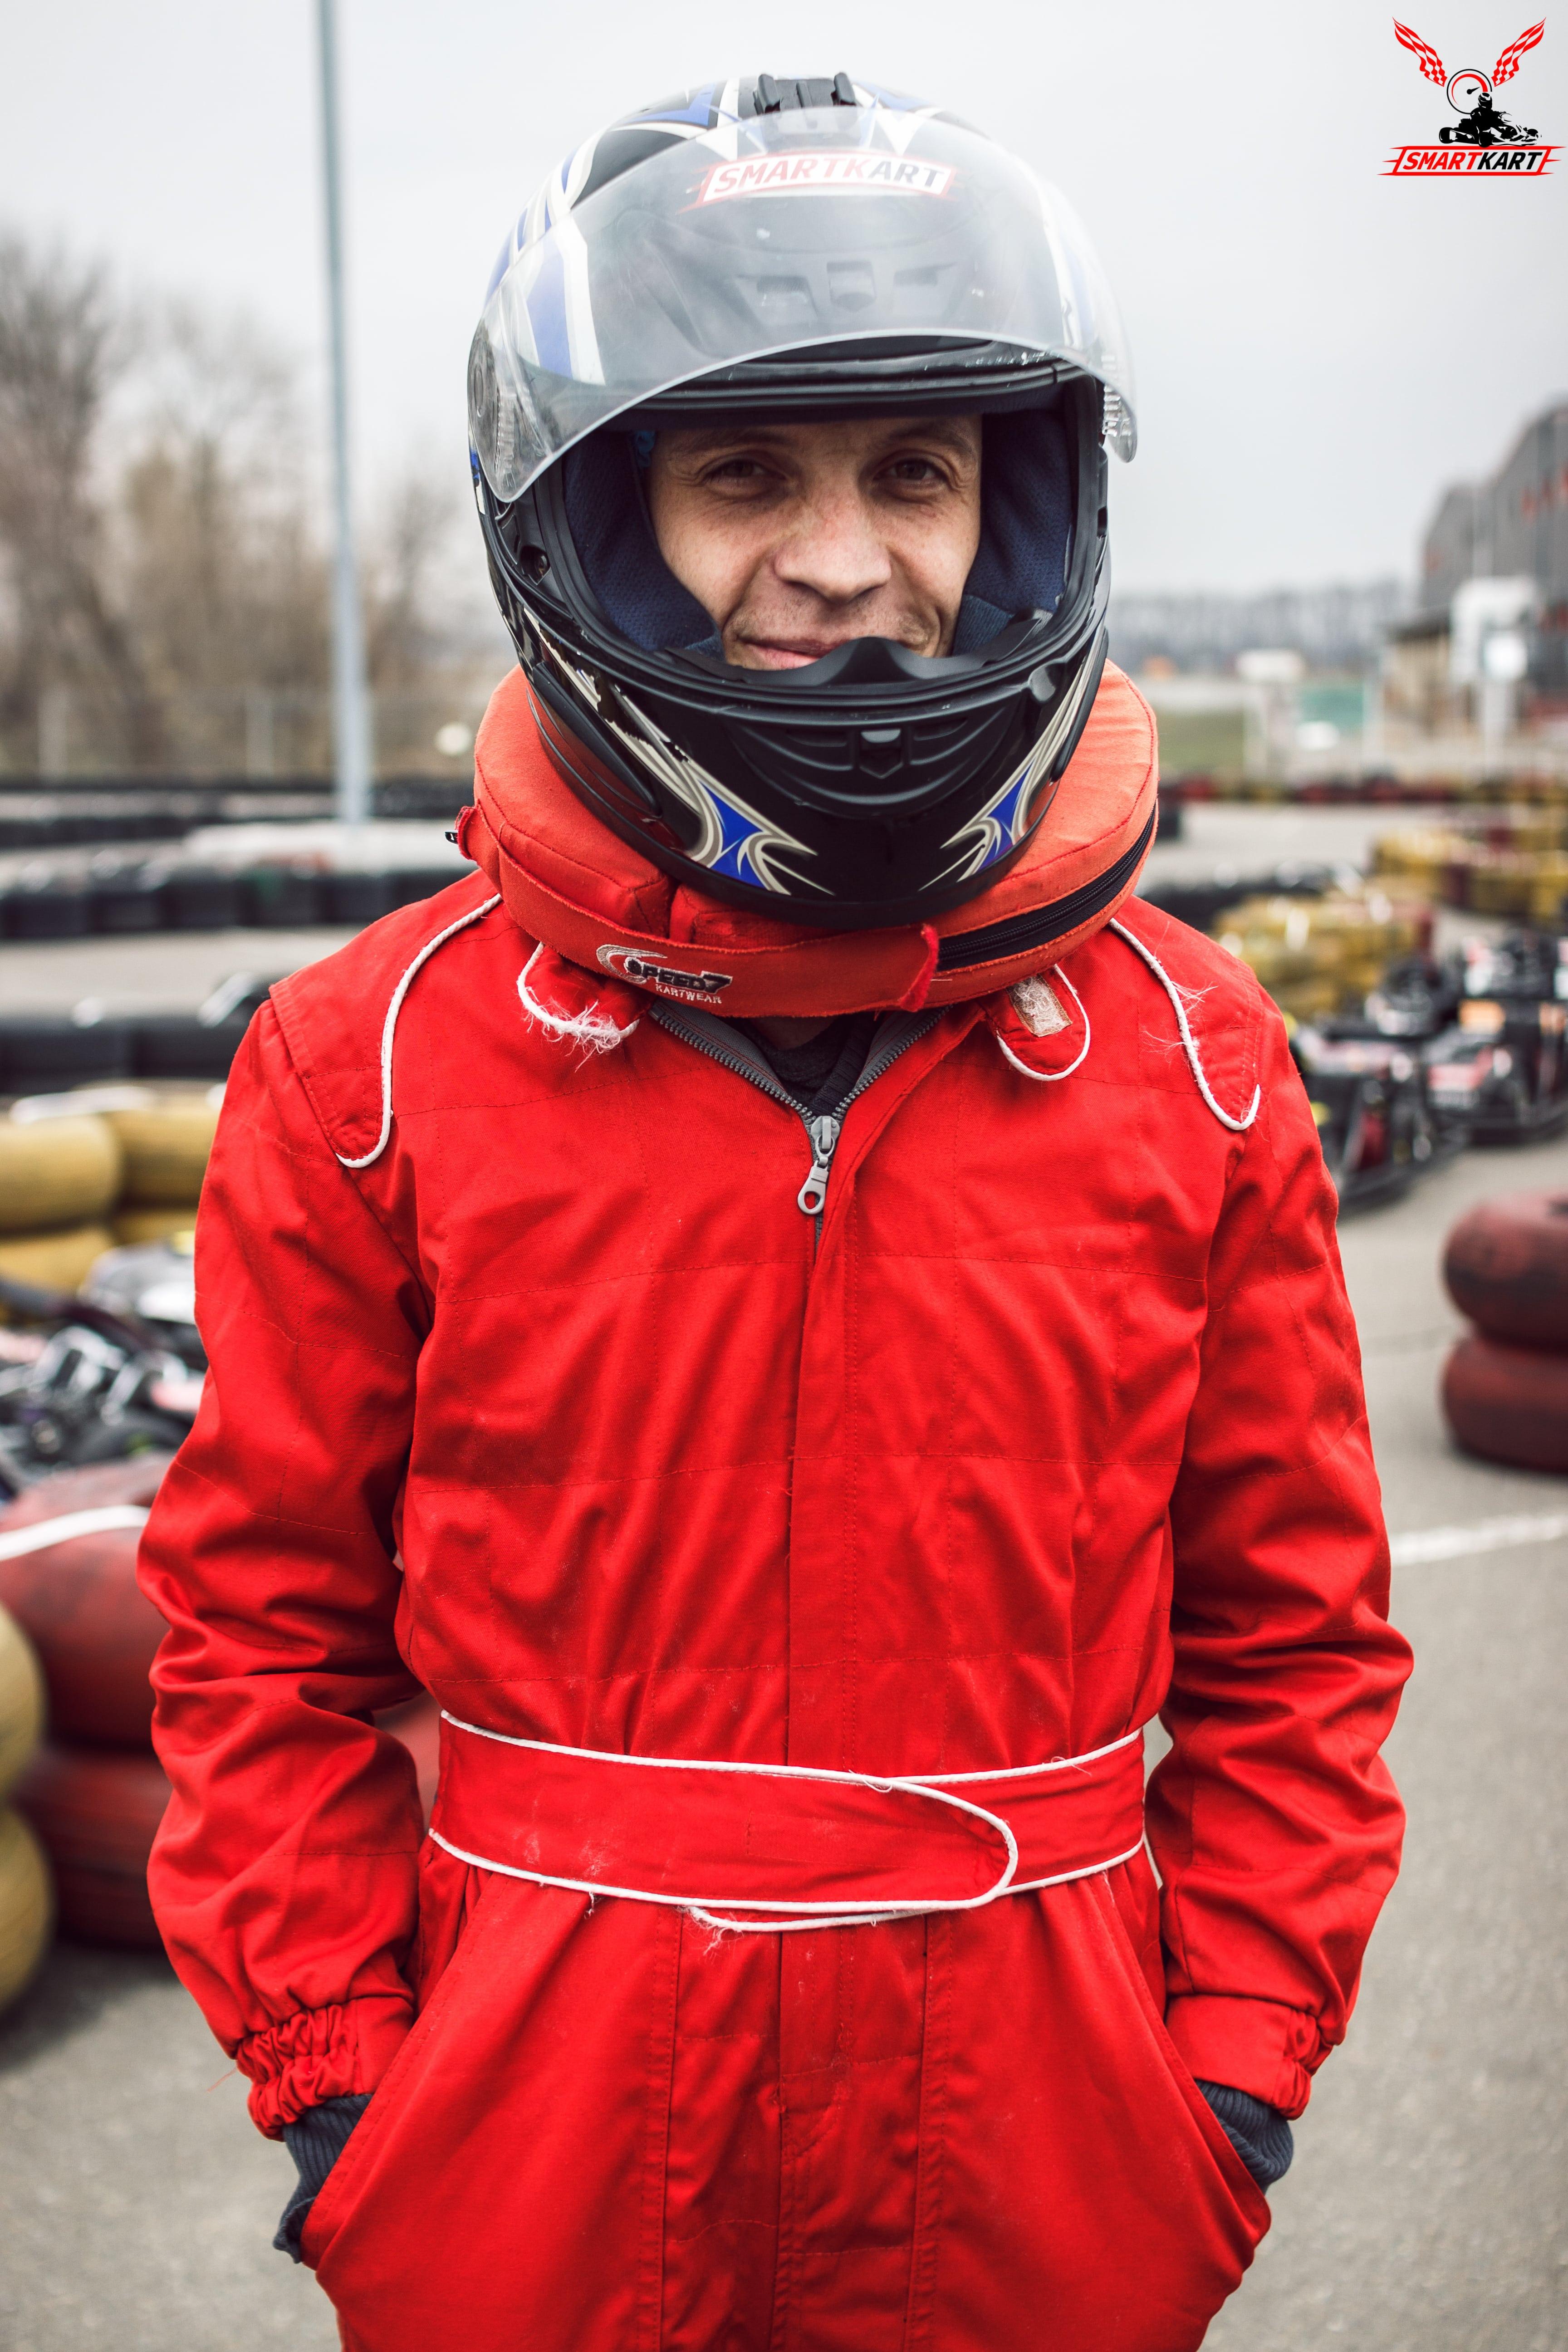 Smart-karting-foto12